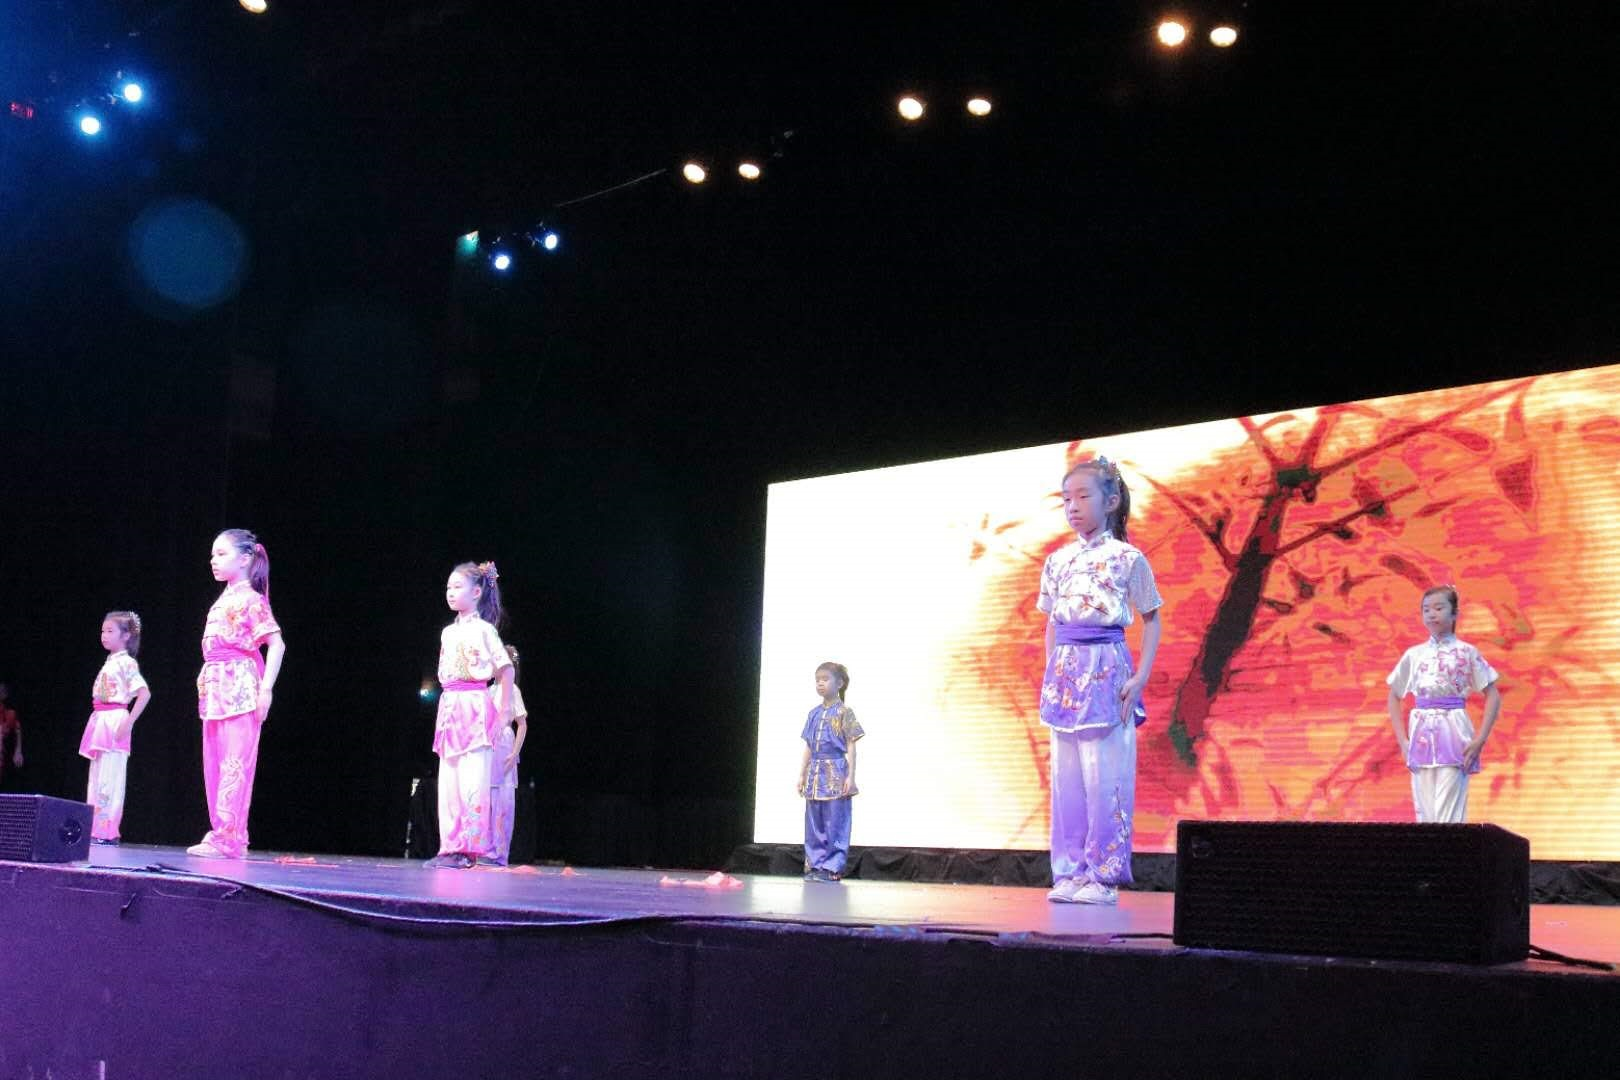 wayland-li-wushu-children-spring-fesitval-toronto-canada-2019-16.jpg